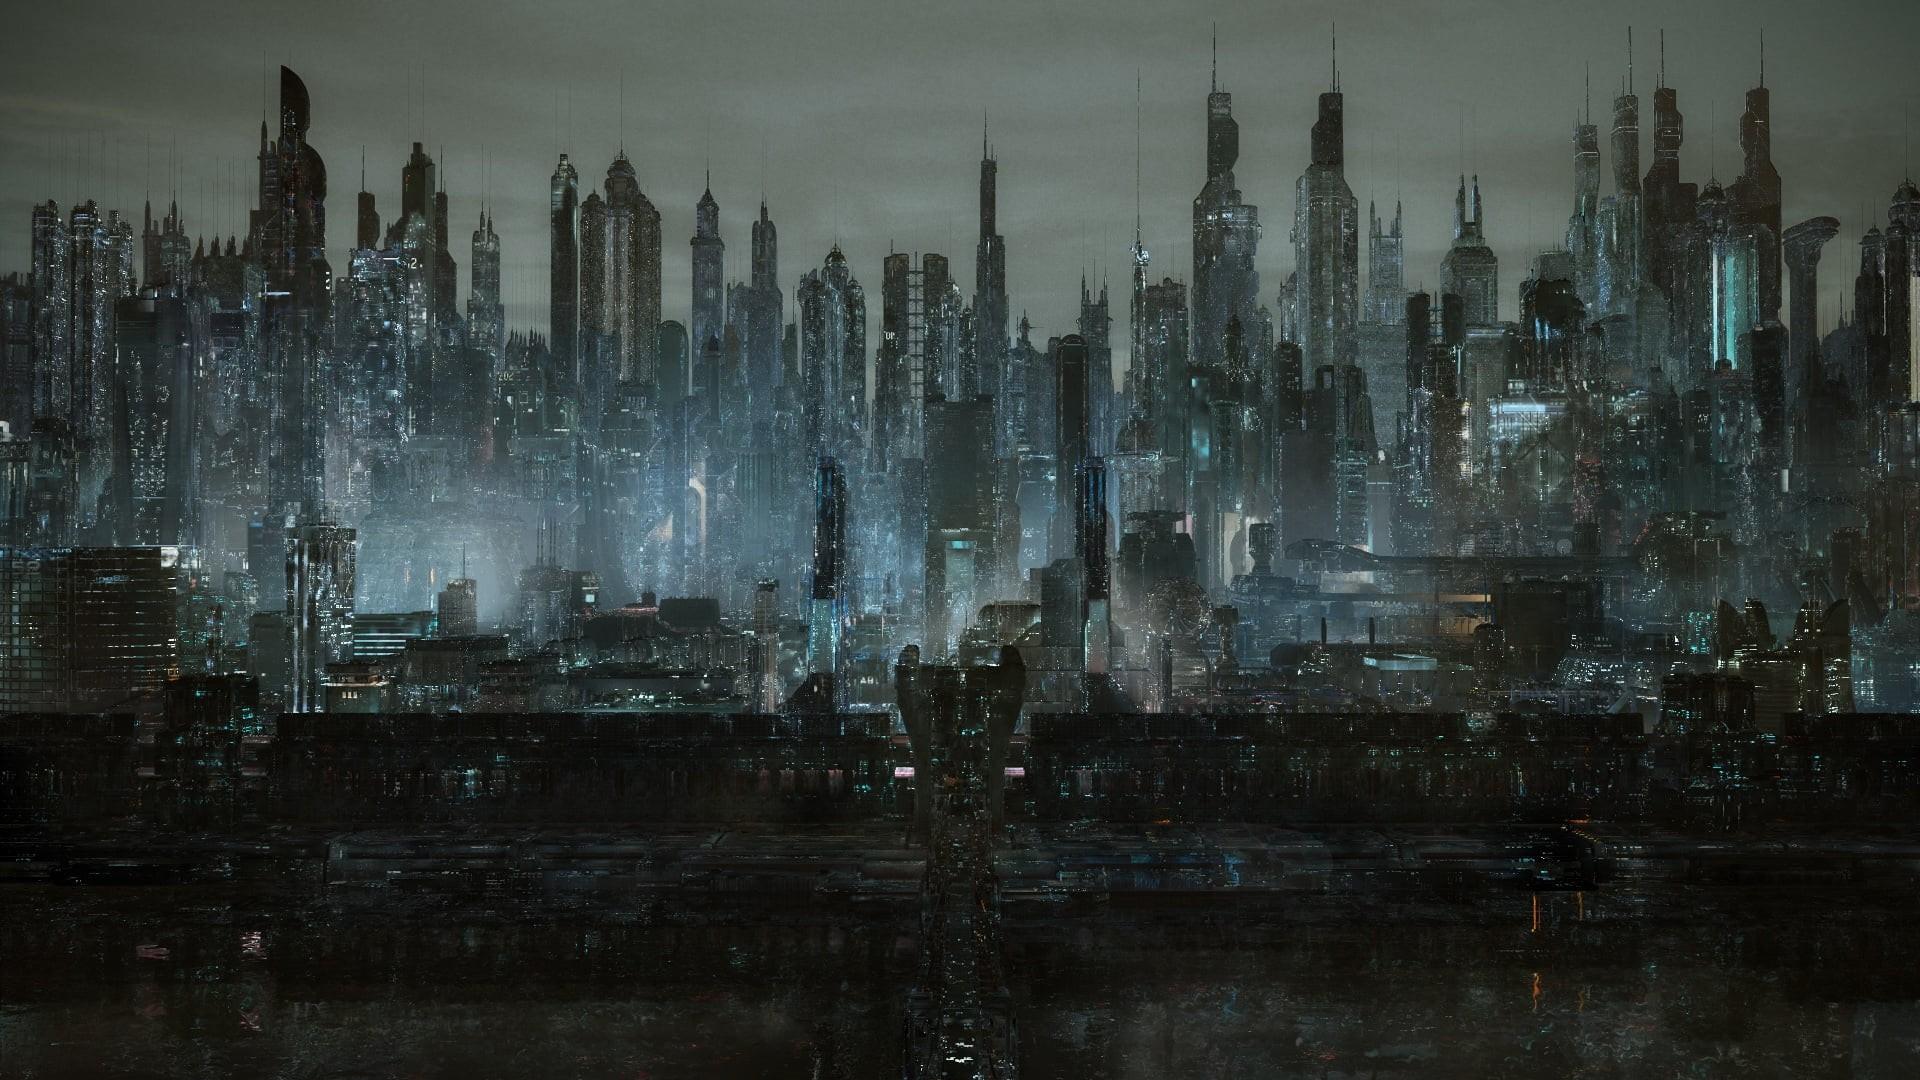 Cyberpunk City Art Picture